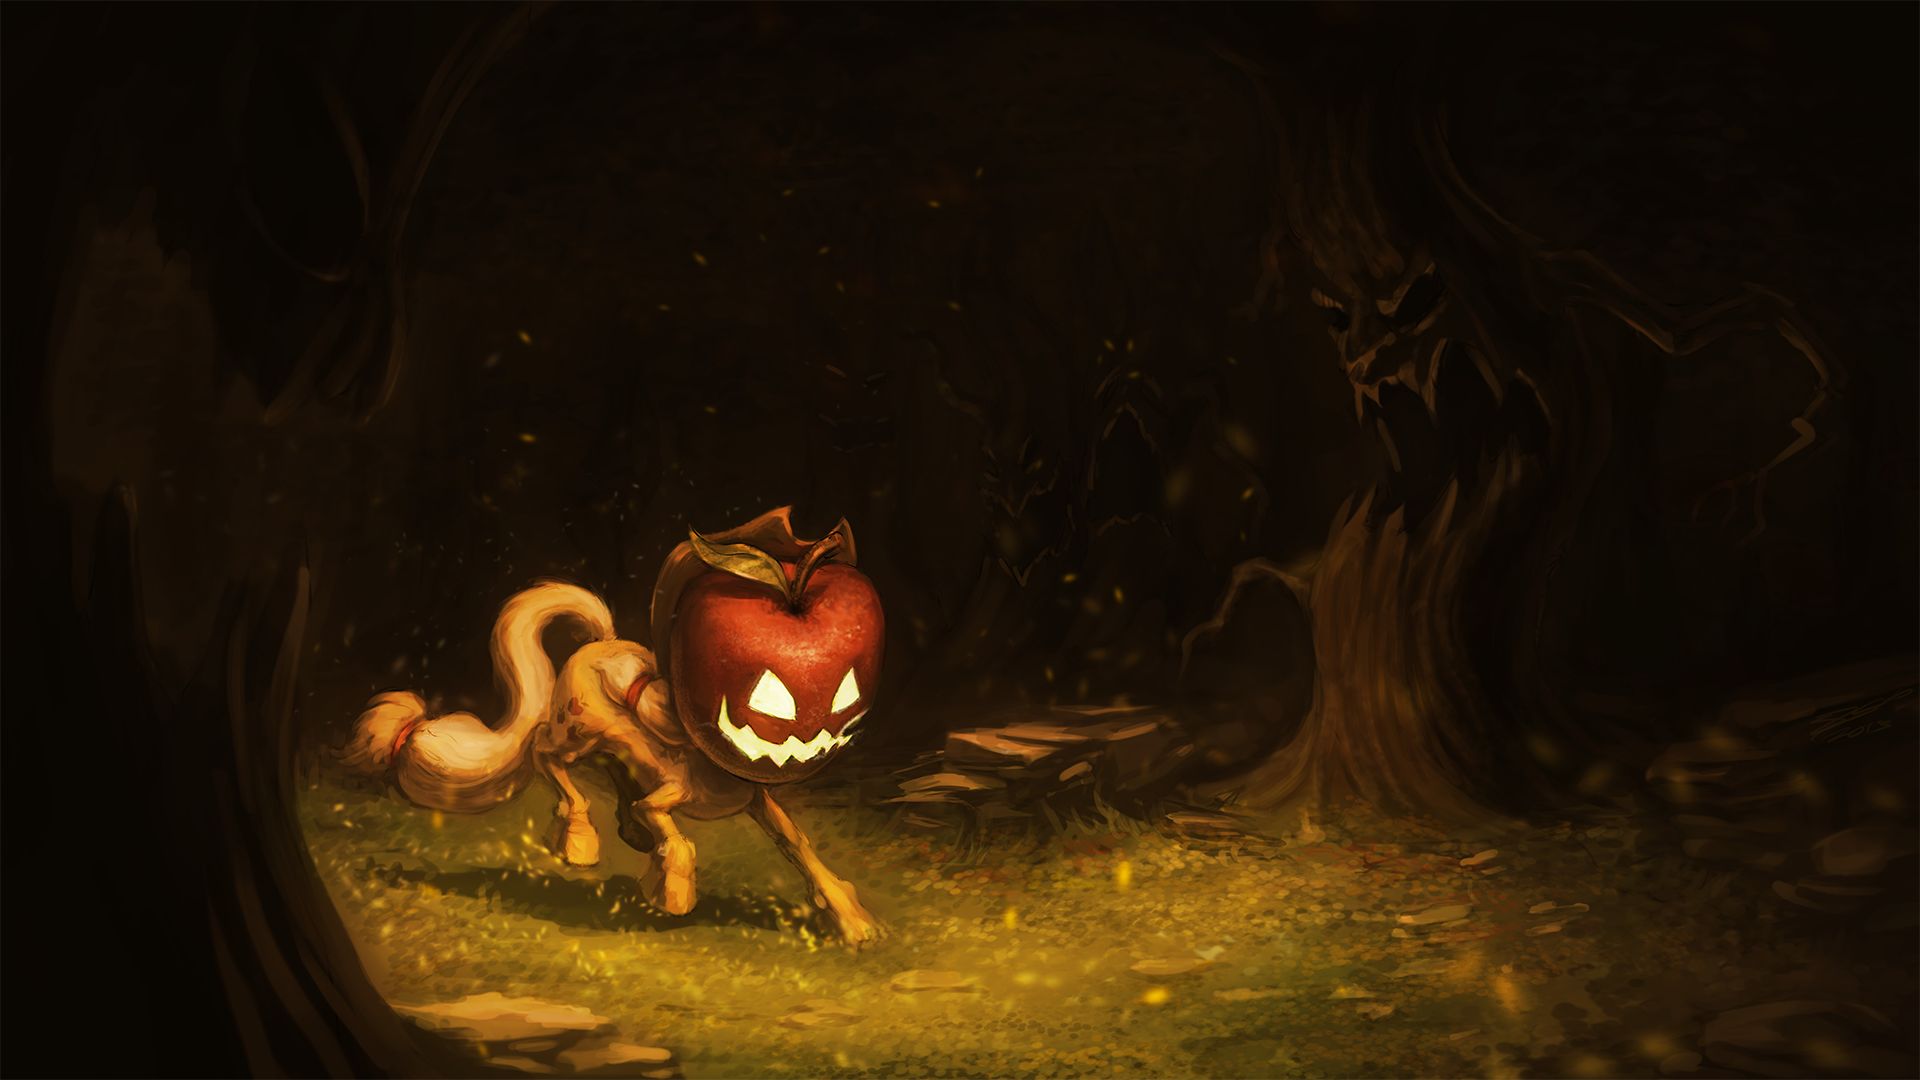 Applejack-O-Lantern by AssasinMonkey